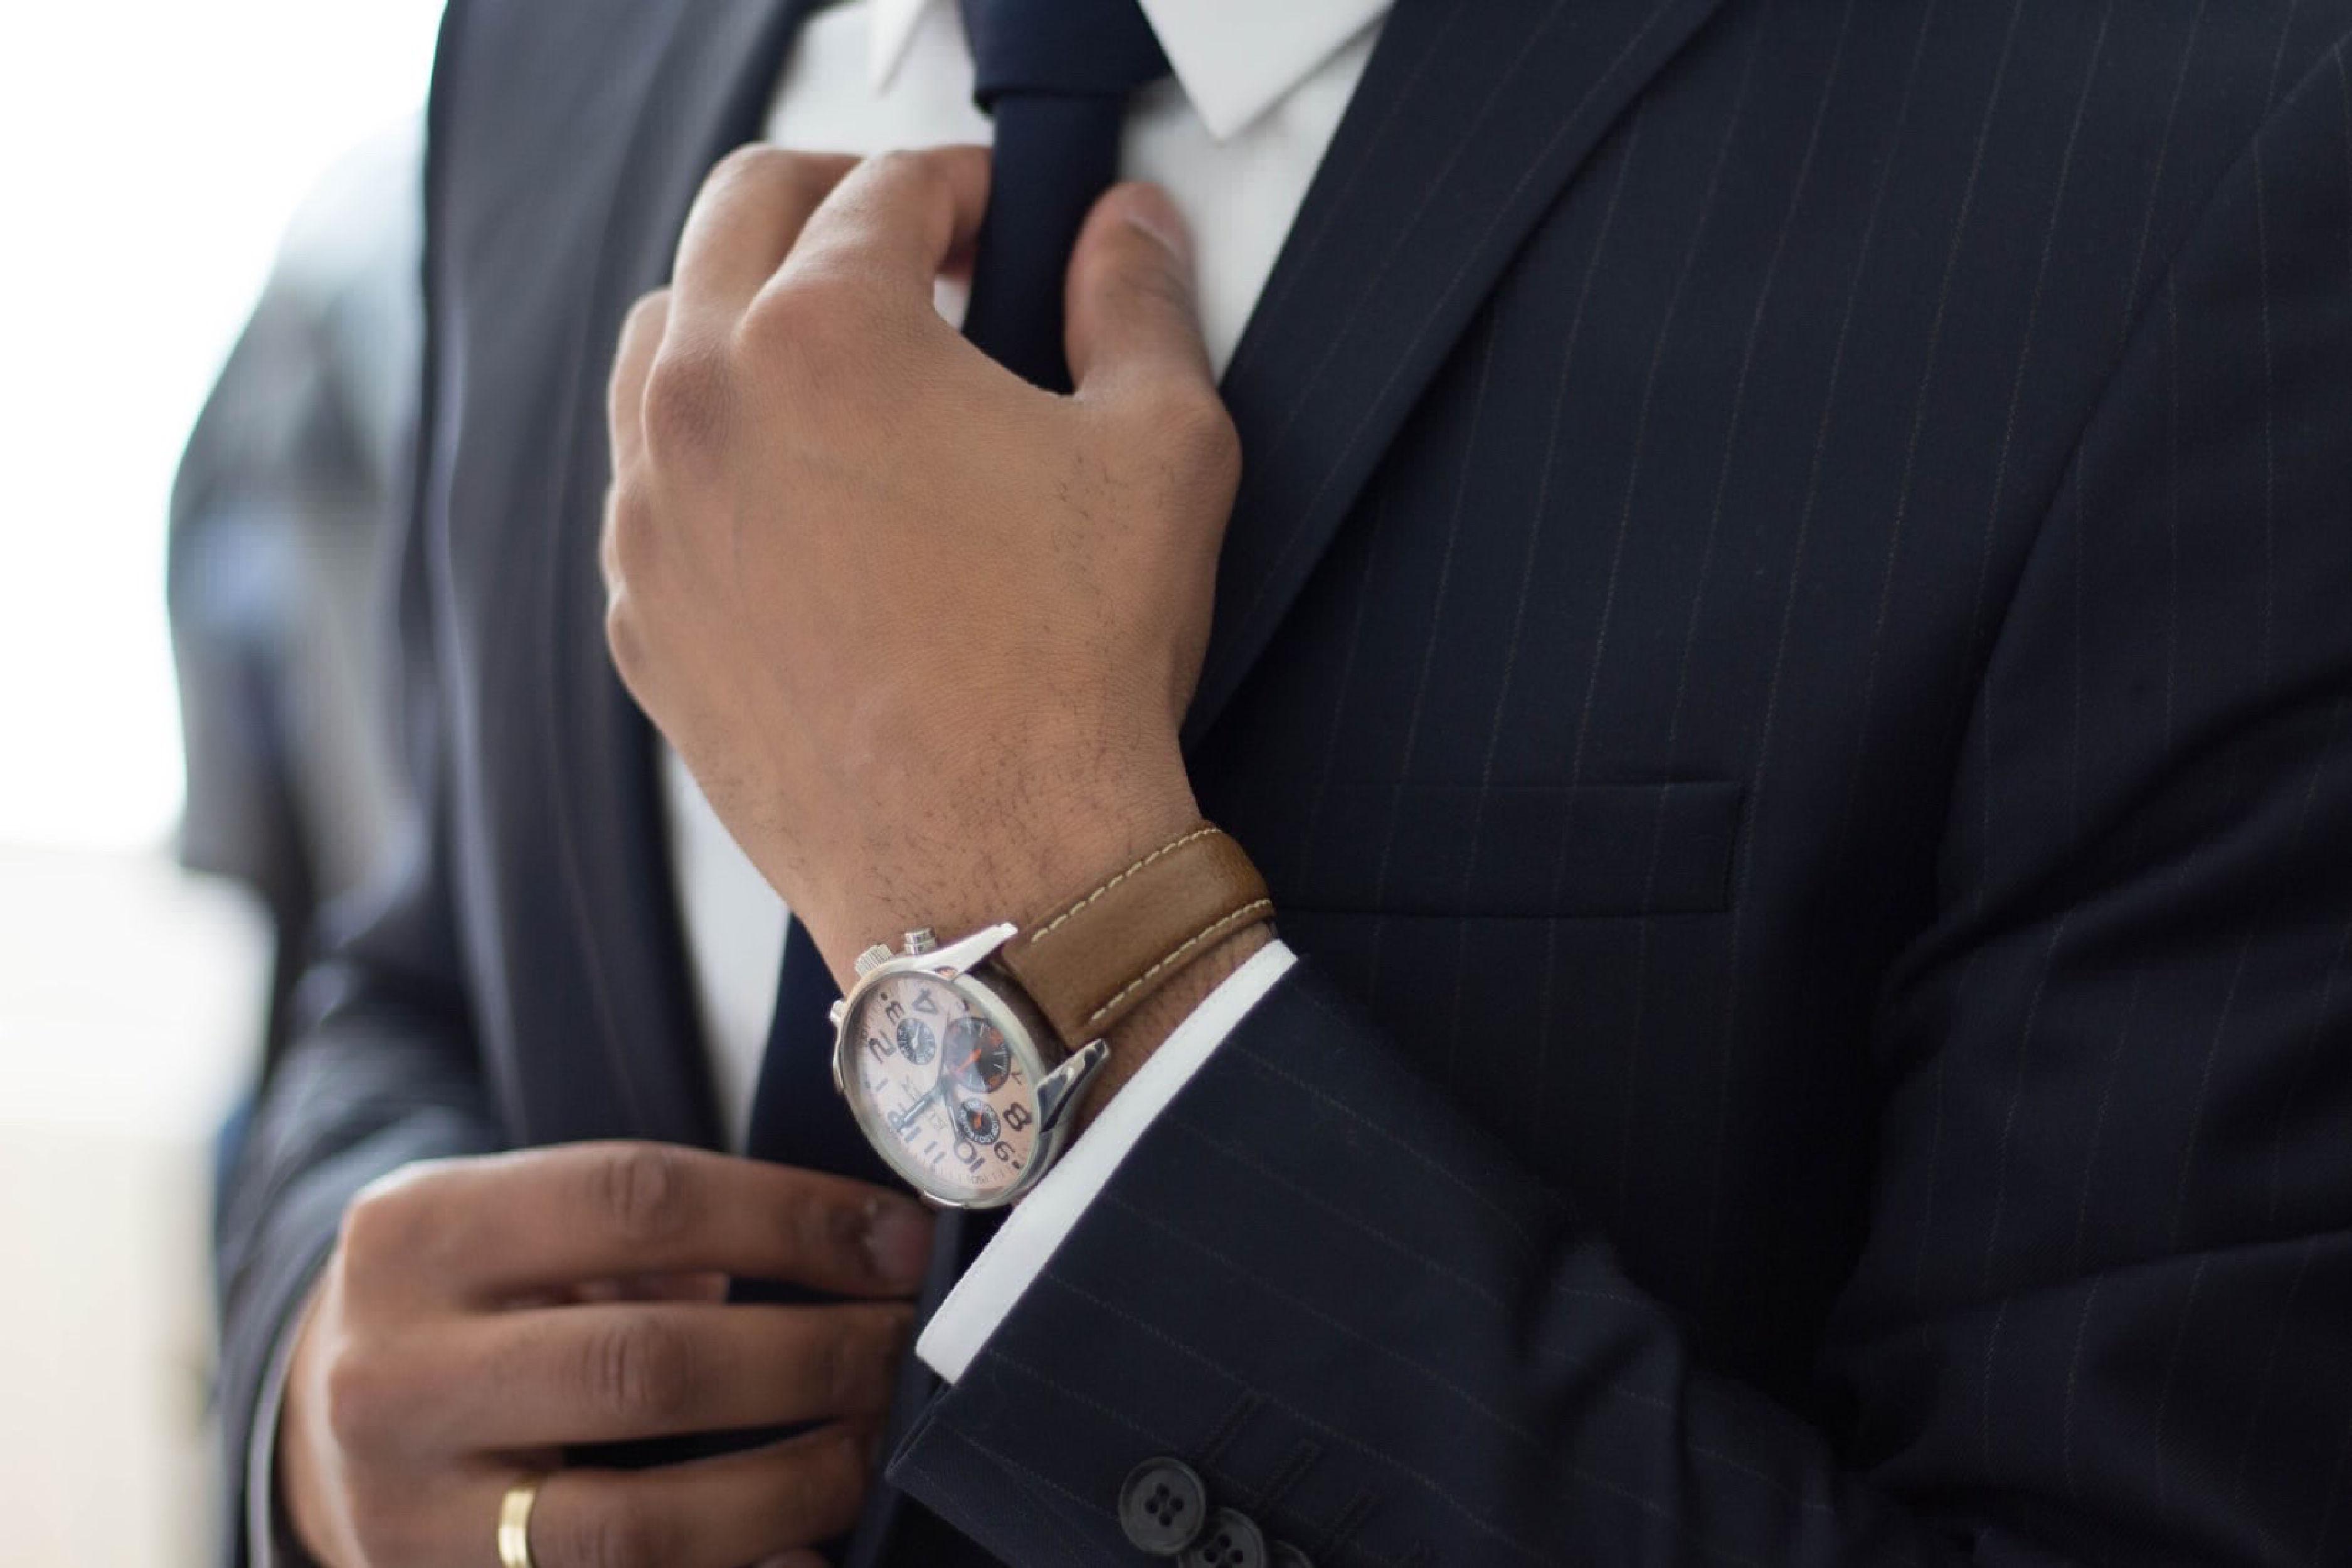 adjusting the tie by Ruthson Zimmerman